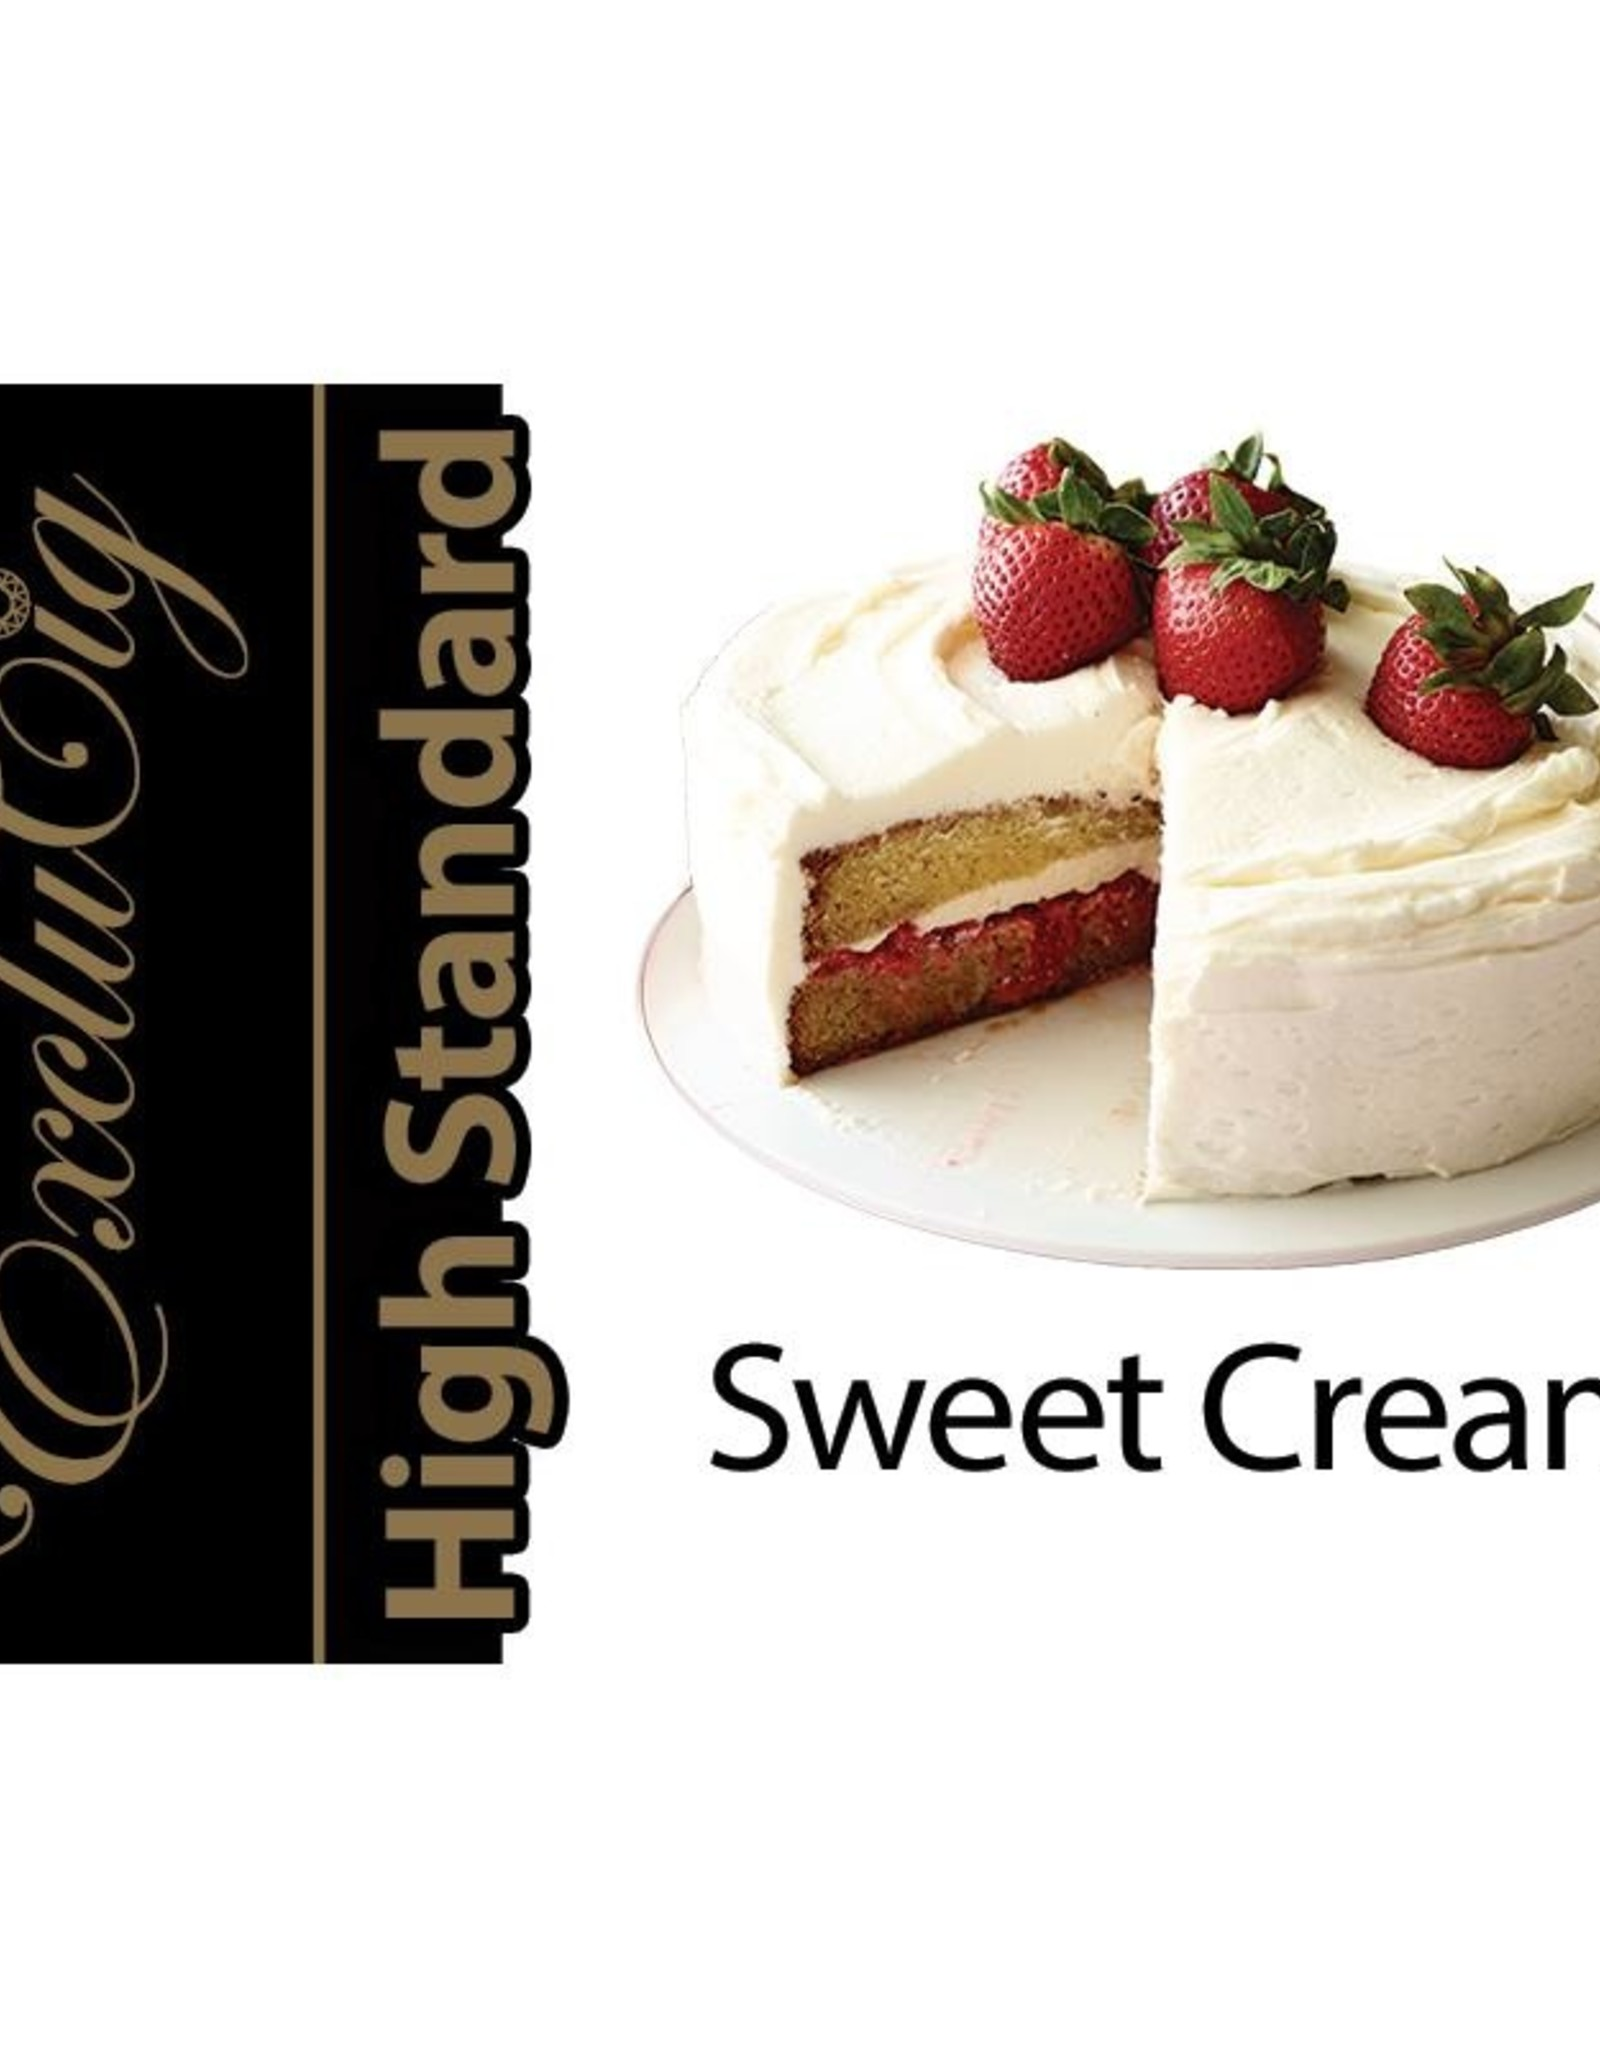 Exclucig Exclucig High Standard E-liquid Sweet Cream 6 mg Nicotine